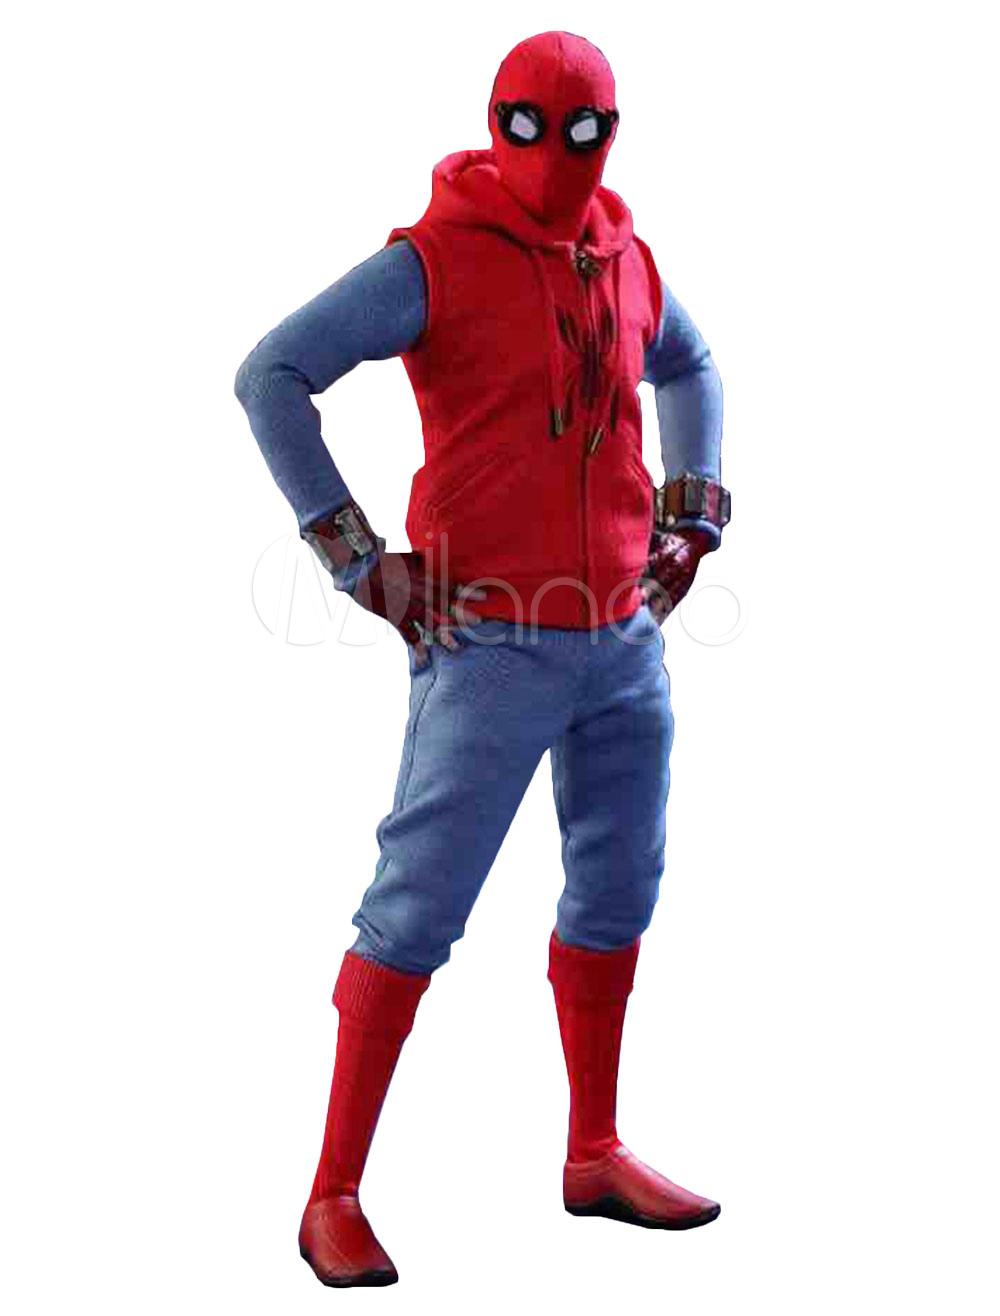 Spiderman Homecoming Marvel Comics Cosplay Costume Halloween